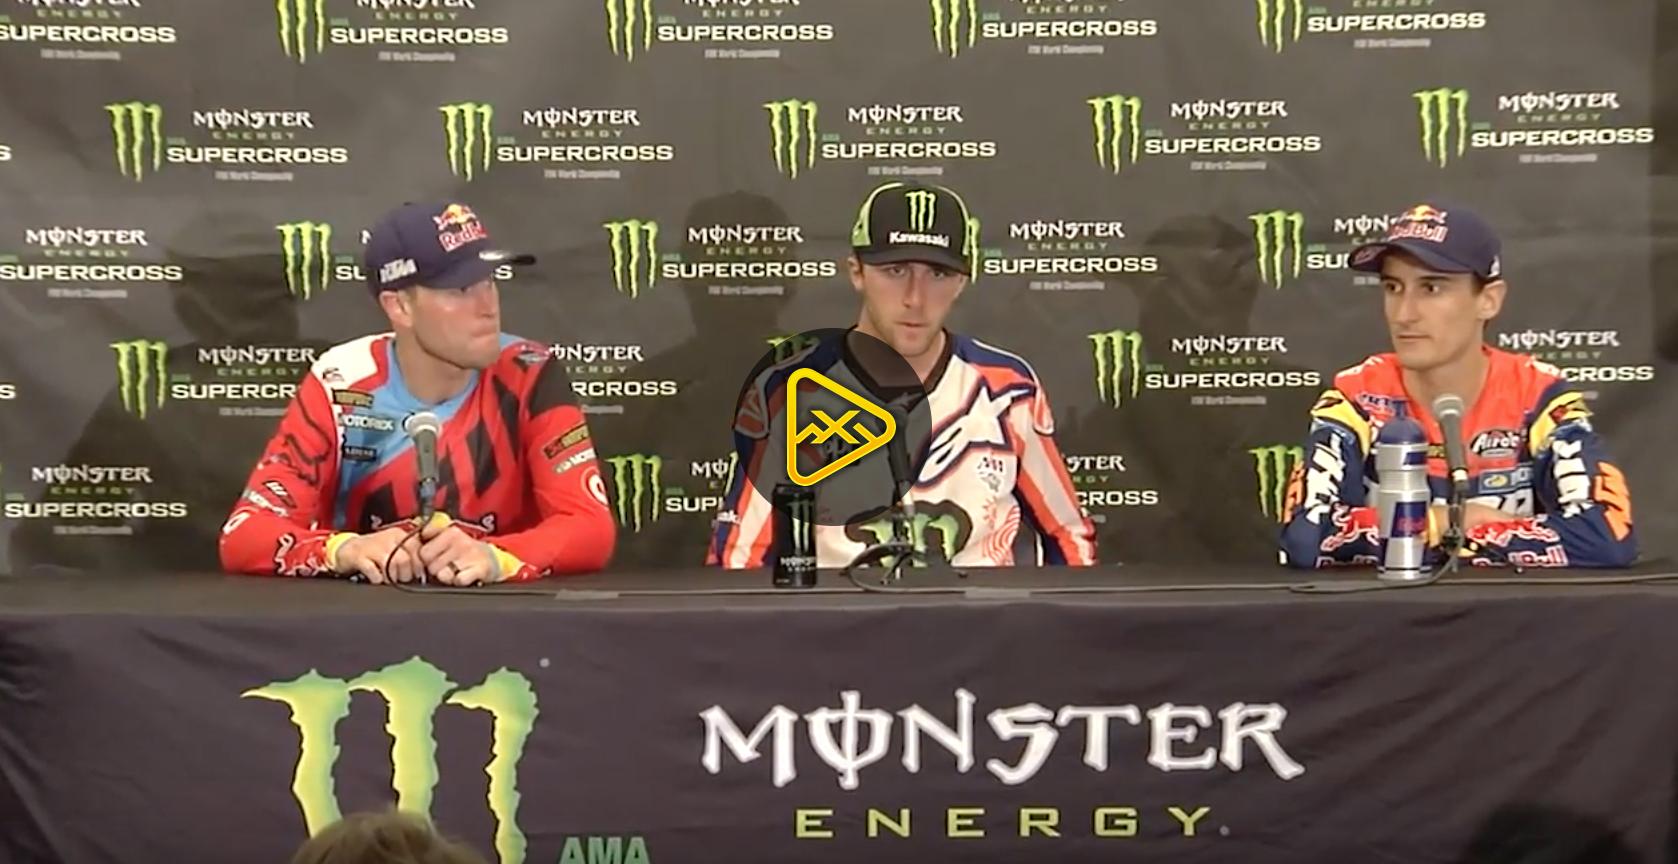 450SX Press Conference – 2017 Indianapolis SX